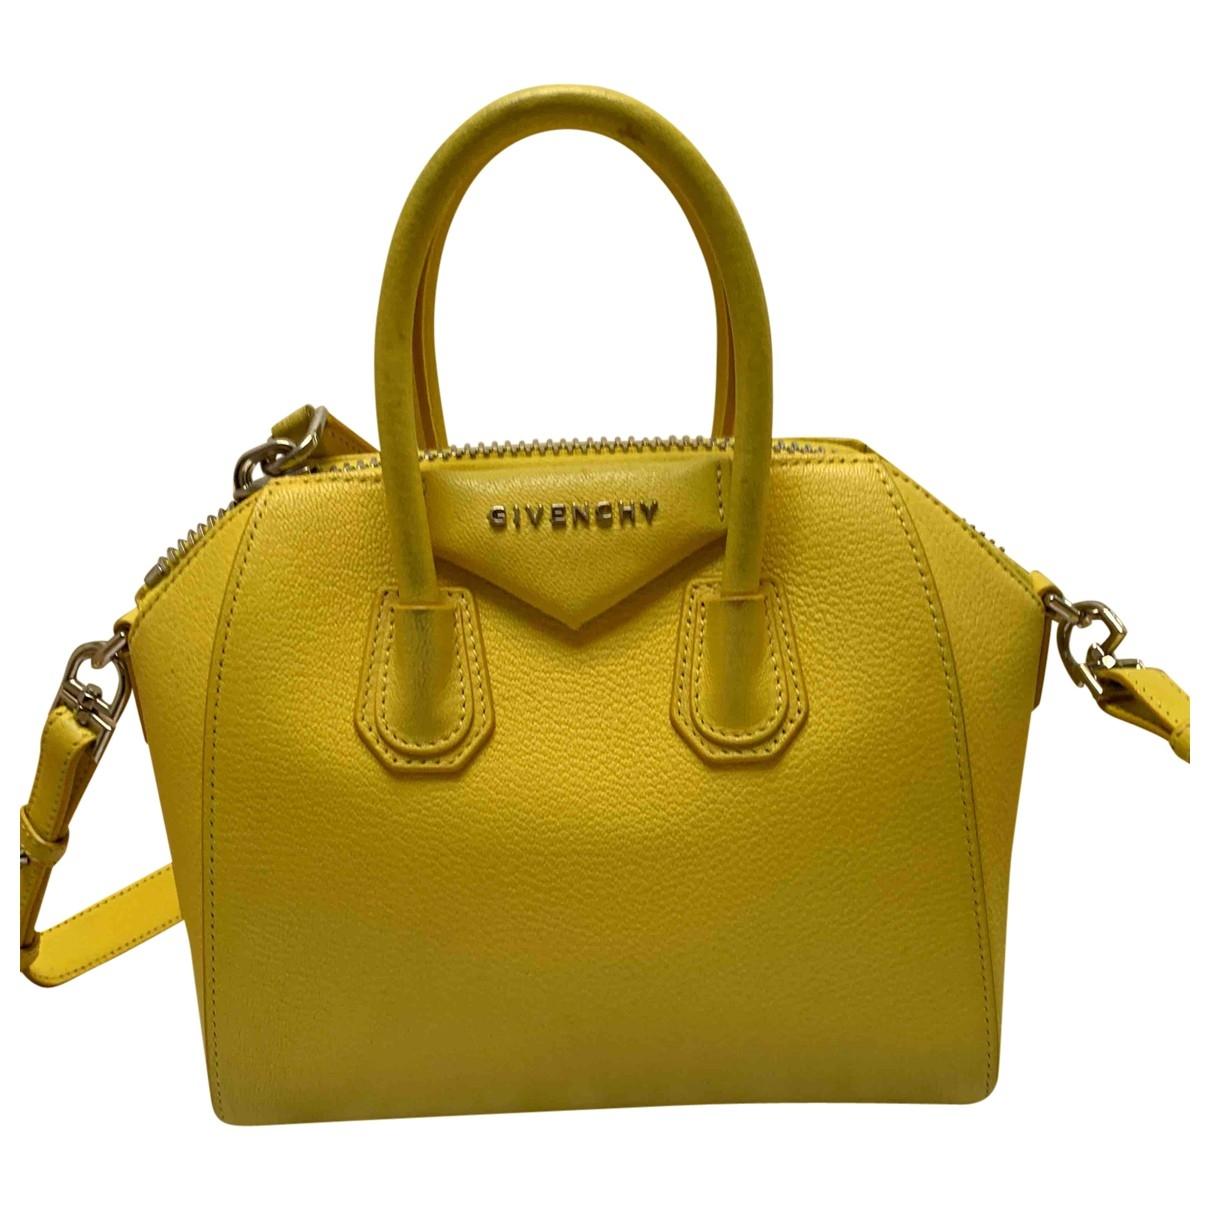 Givenchy Antigona Yellow Leather handbag for Women \N